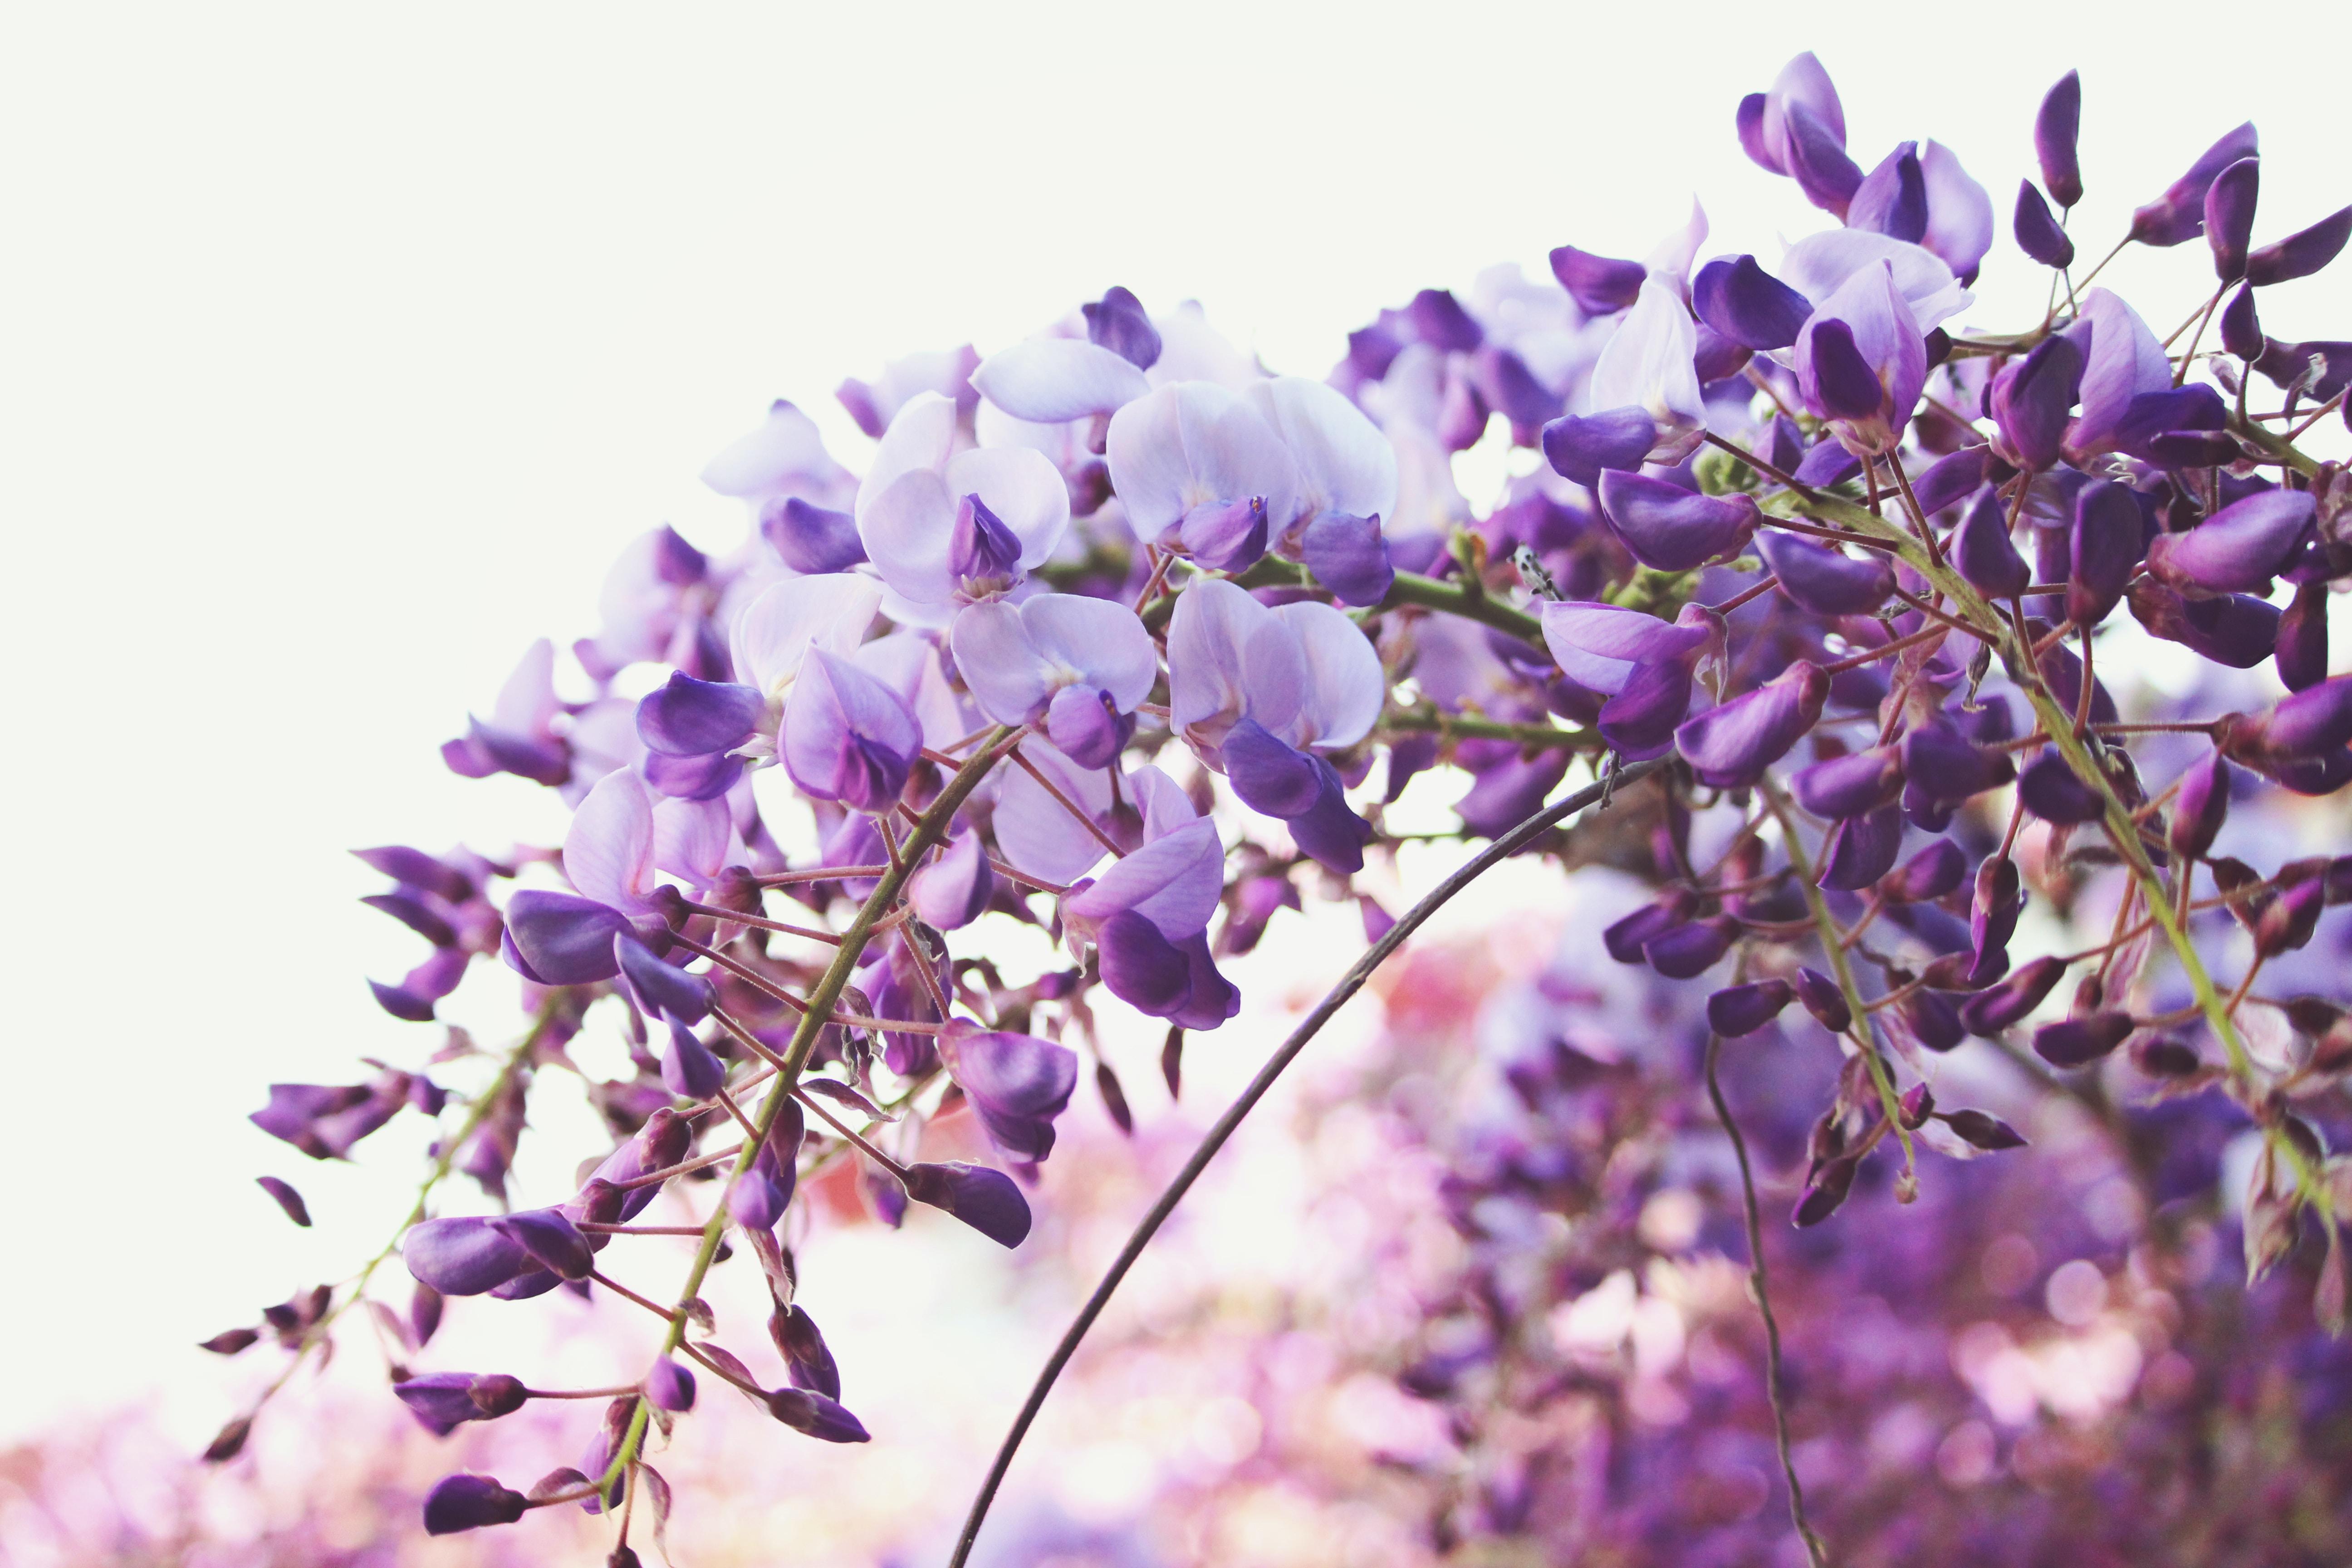 tilt shift lens photography of purple flowers